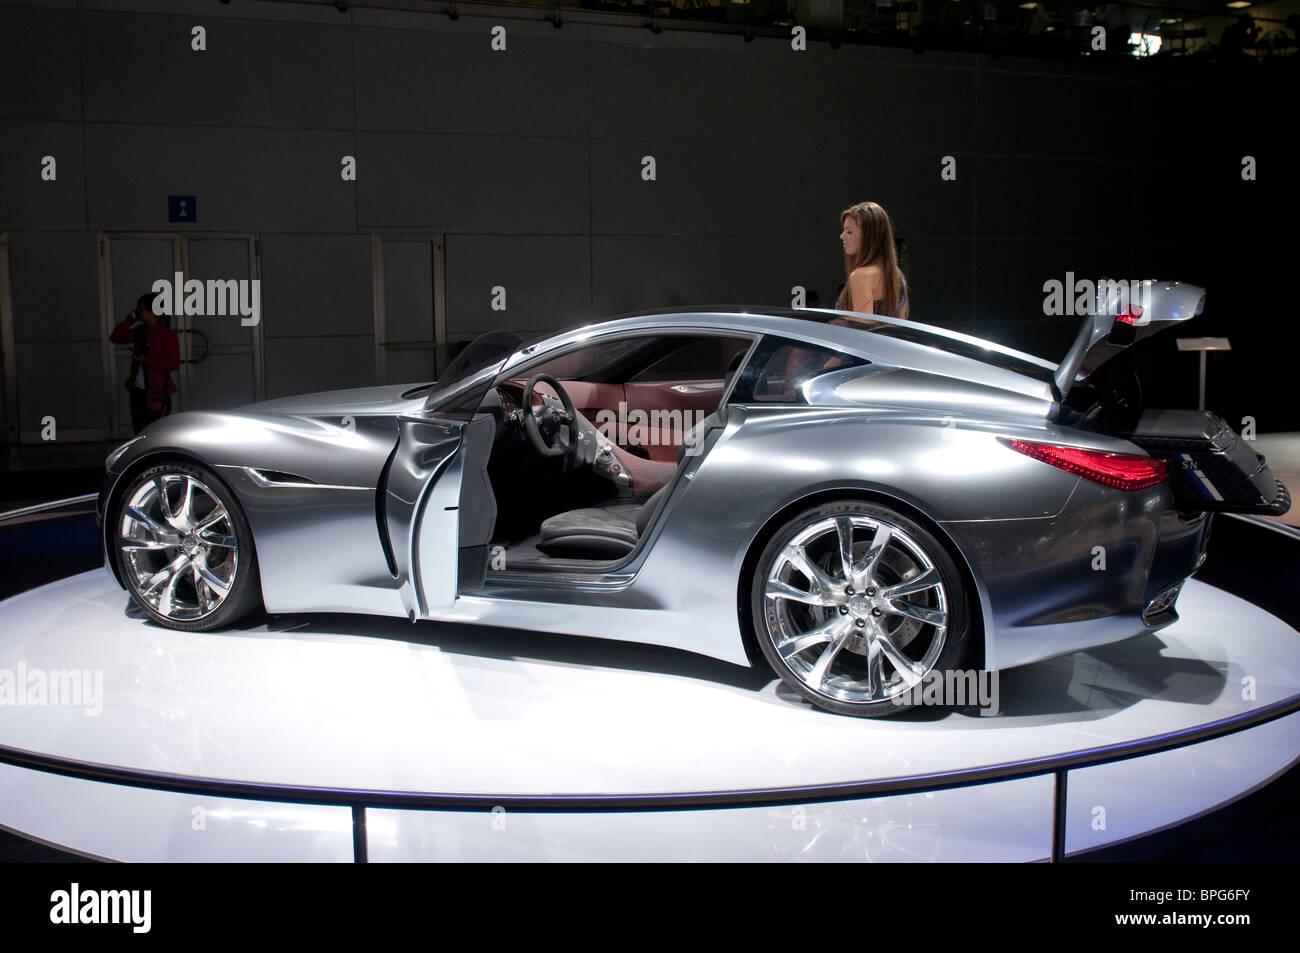 Mosca, Russia - 26 agosto: Moscow International Automobile Salon 2010. Infiniti Essence Concept car Immagini Stock